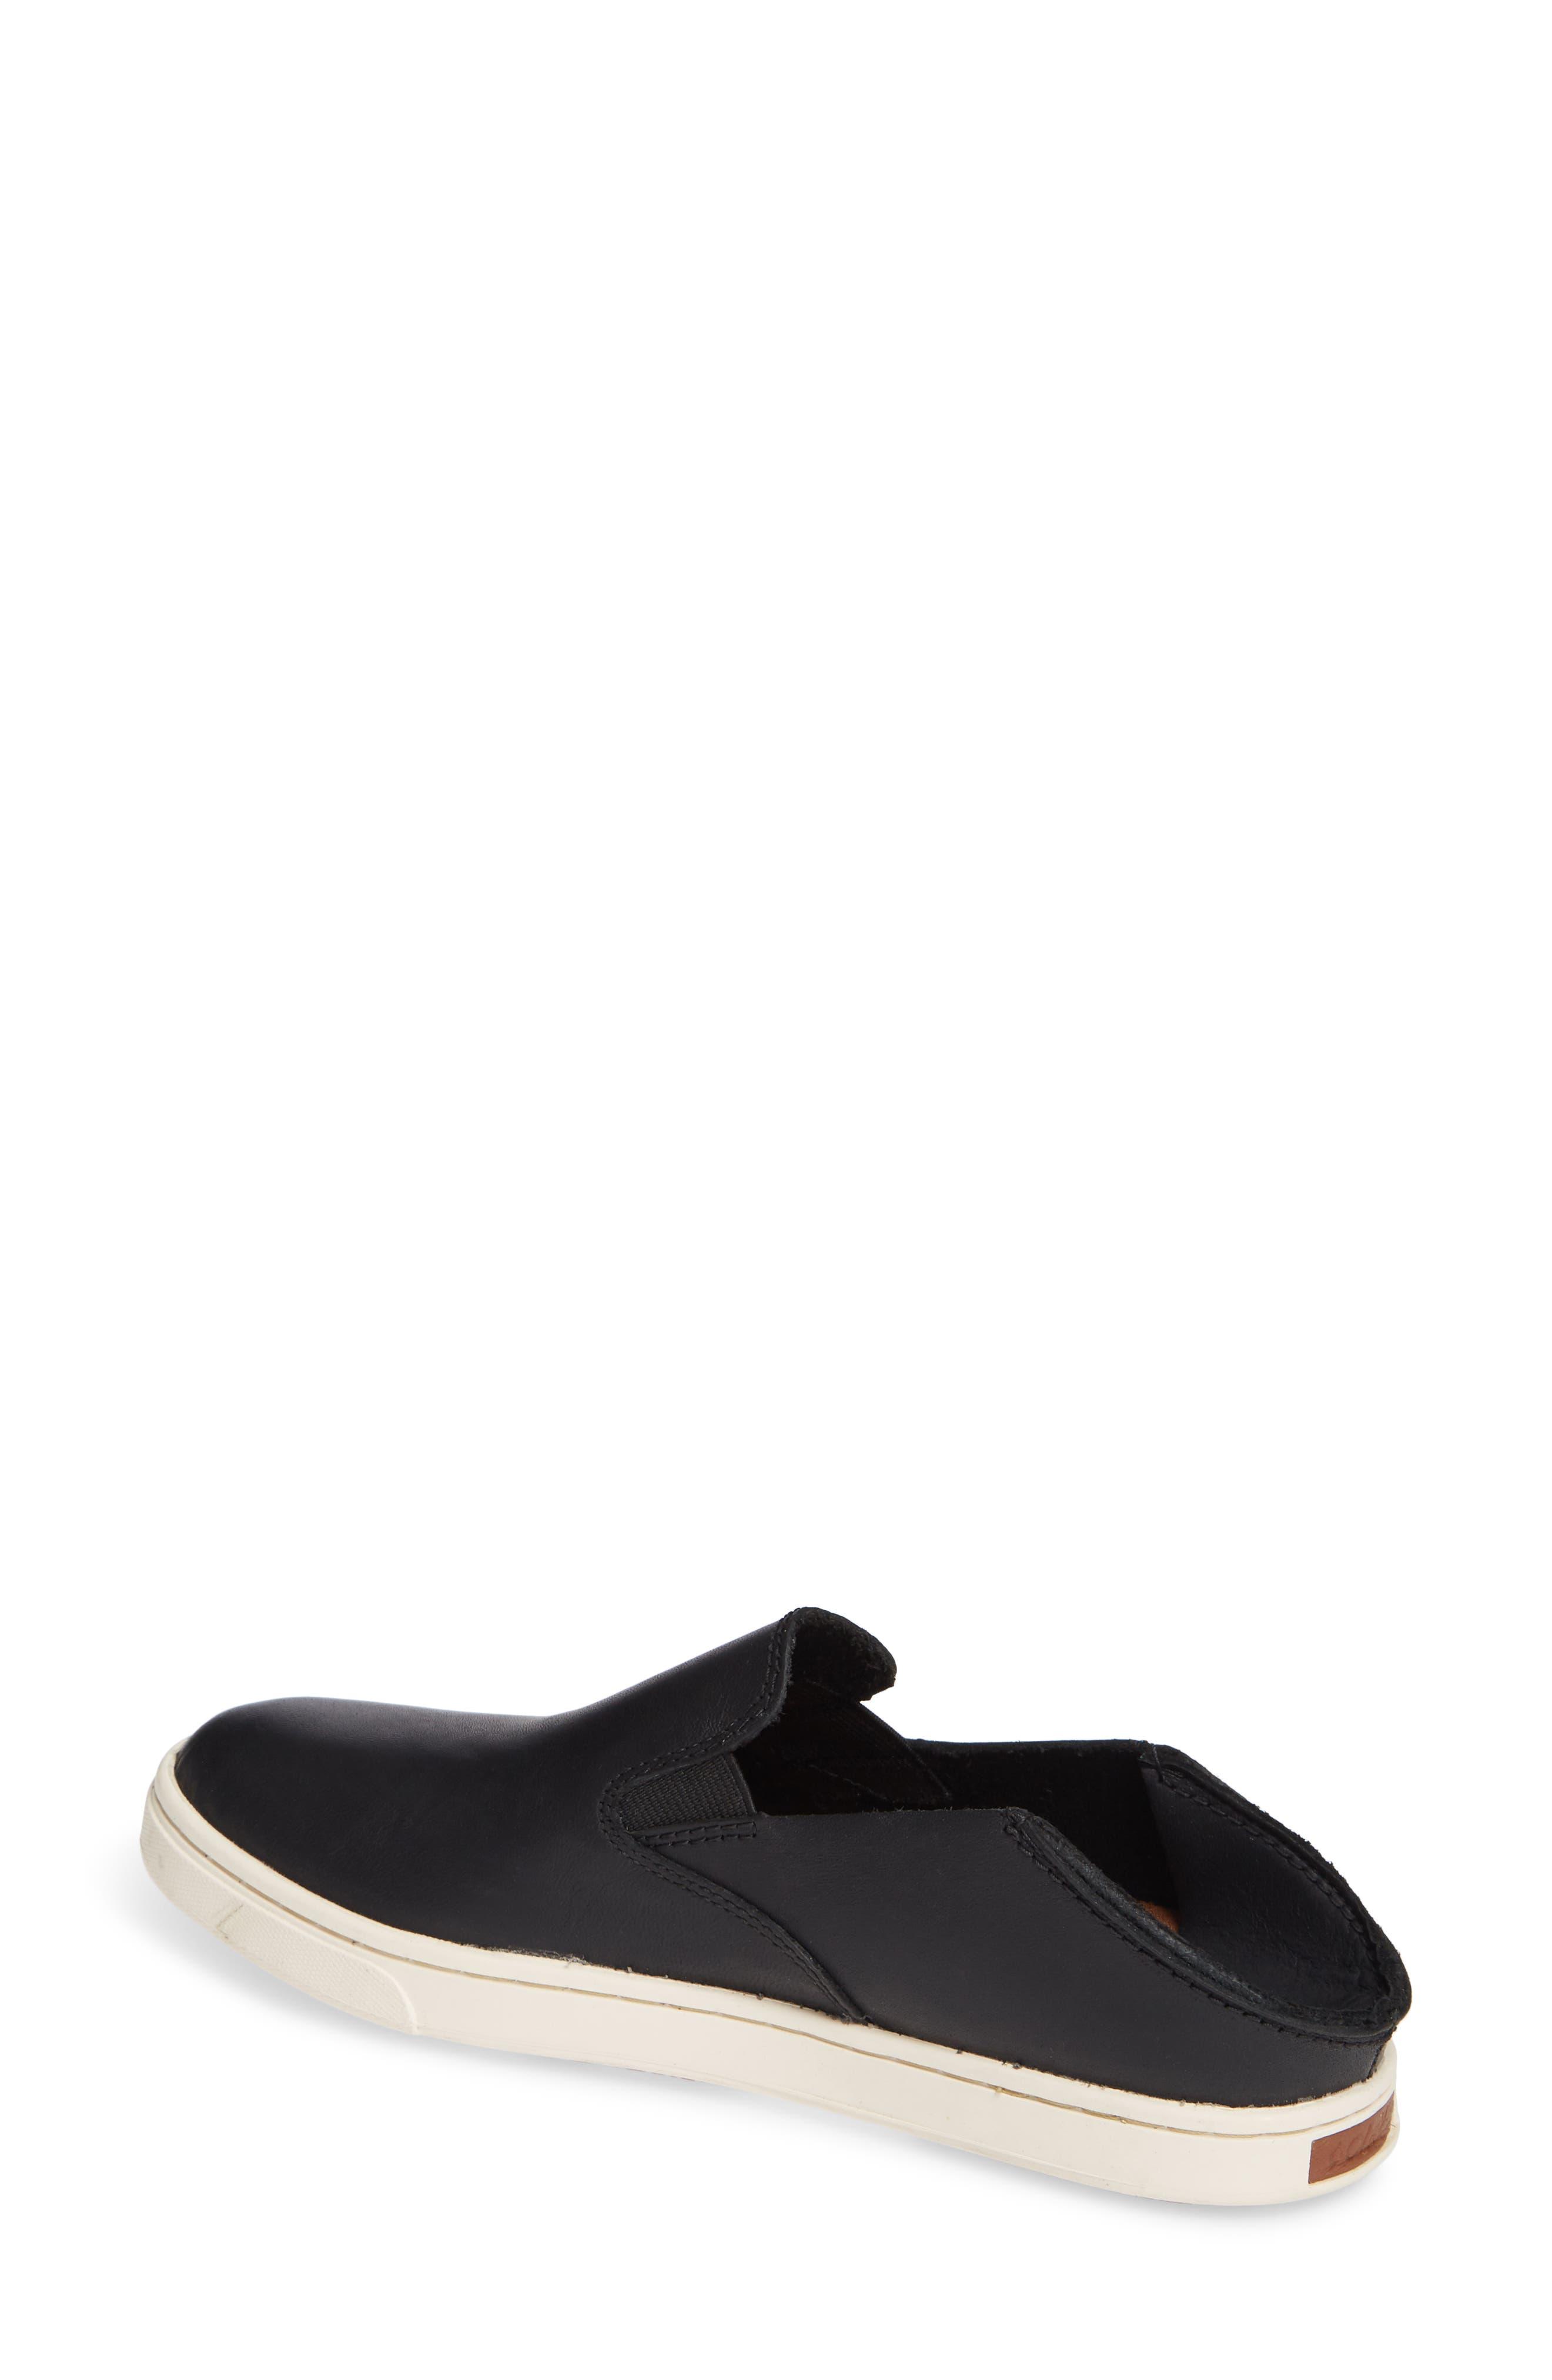 Pehuea Slip-On Sneaker,                             Alternate thumbnail 3, color,                             BLACK/ BLACK LEATHER